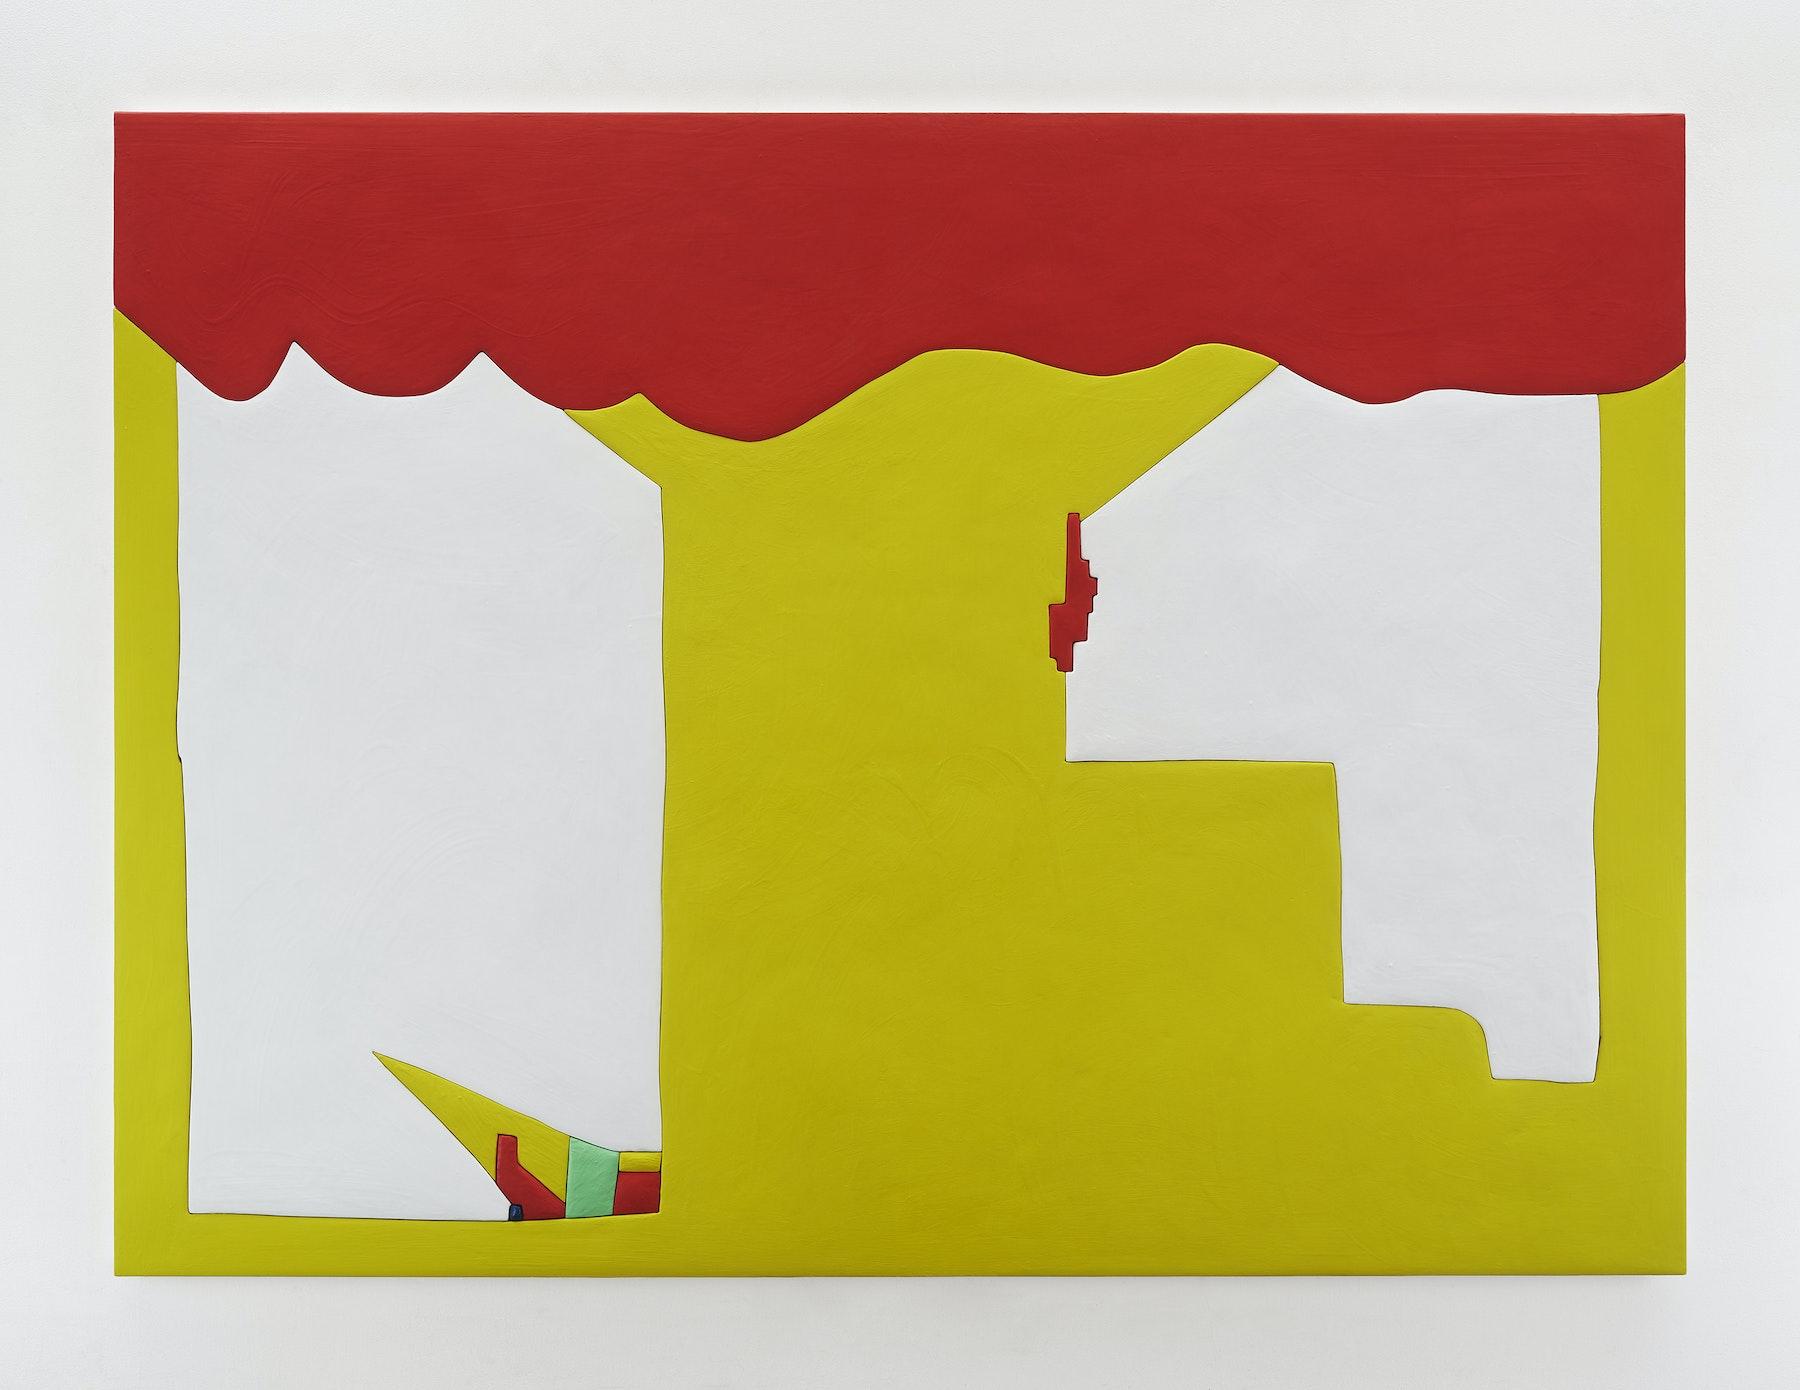 "Sadie Benning ""Tree,"" 2019 Wood, aqua resin, casein, and acrylic gouache 59 x 80"" [HxW] (149.86 x 203.2 cm) Inventory #BEN857 Courtesy of the artist and Vielmetter Los Angeles Photocredit: Chris Austin"